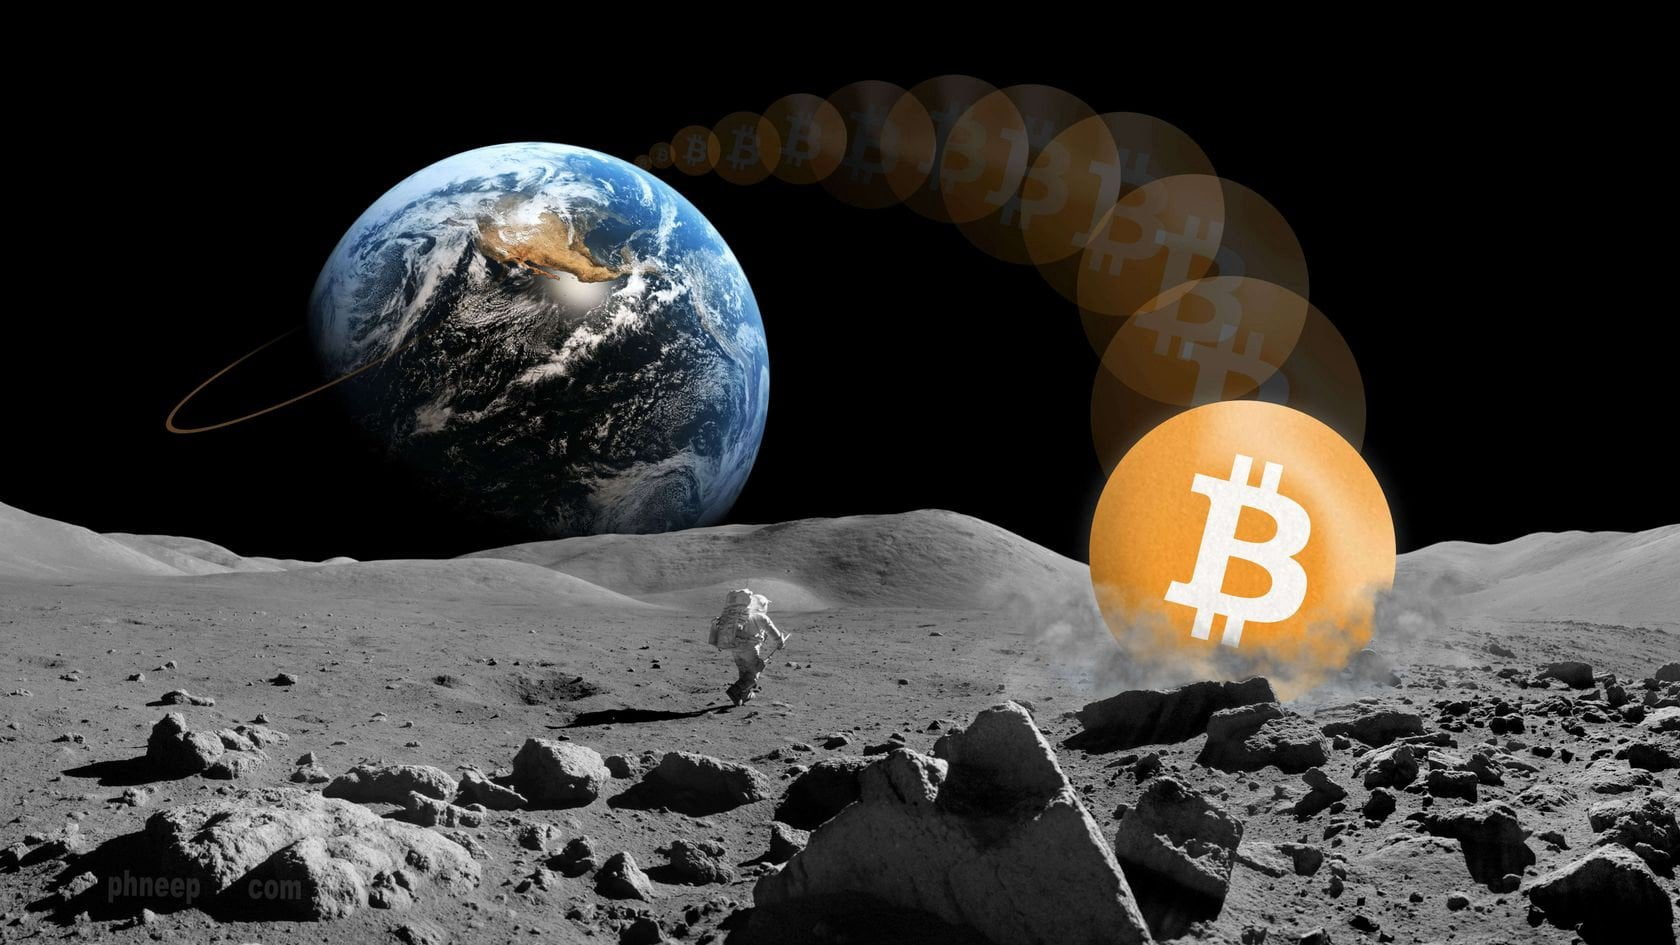 1  hWDVQB2RYVhNmsmUpzqvA - Can Bitcoin Hit $20k In 2020? Mike Novogratz Analyzes The King Coin